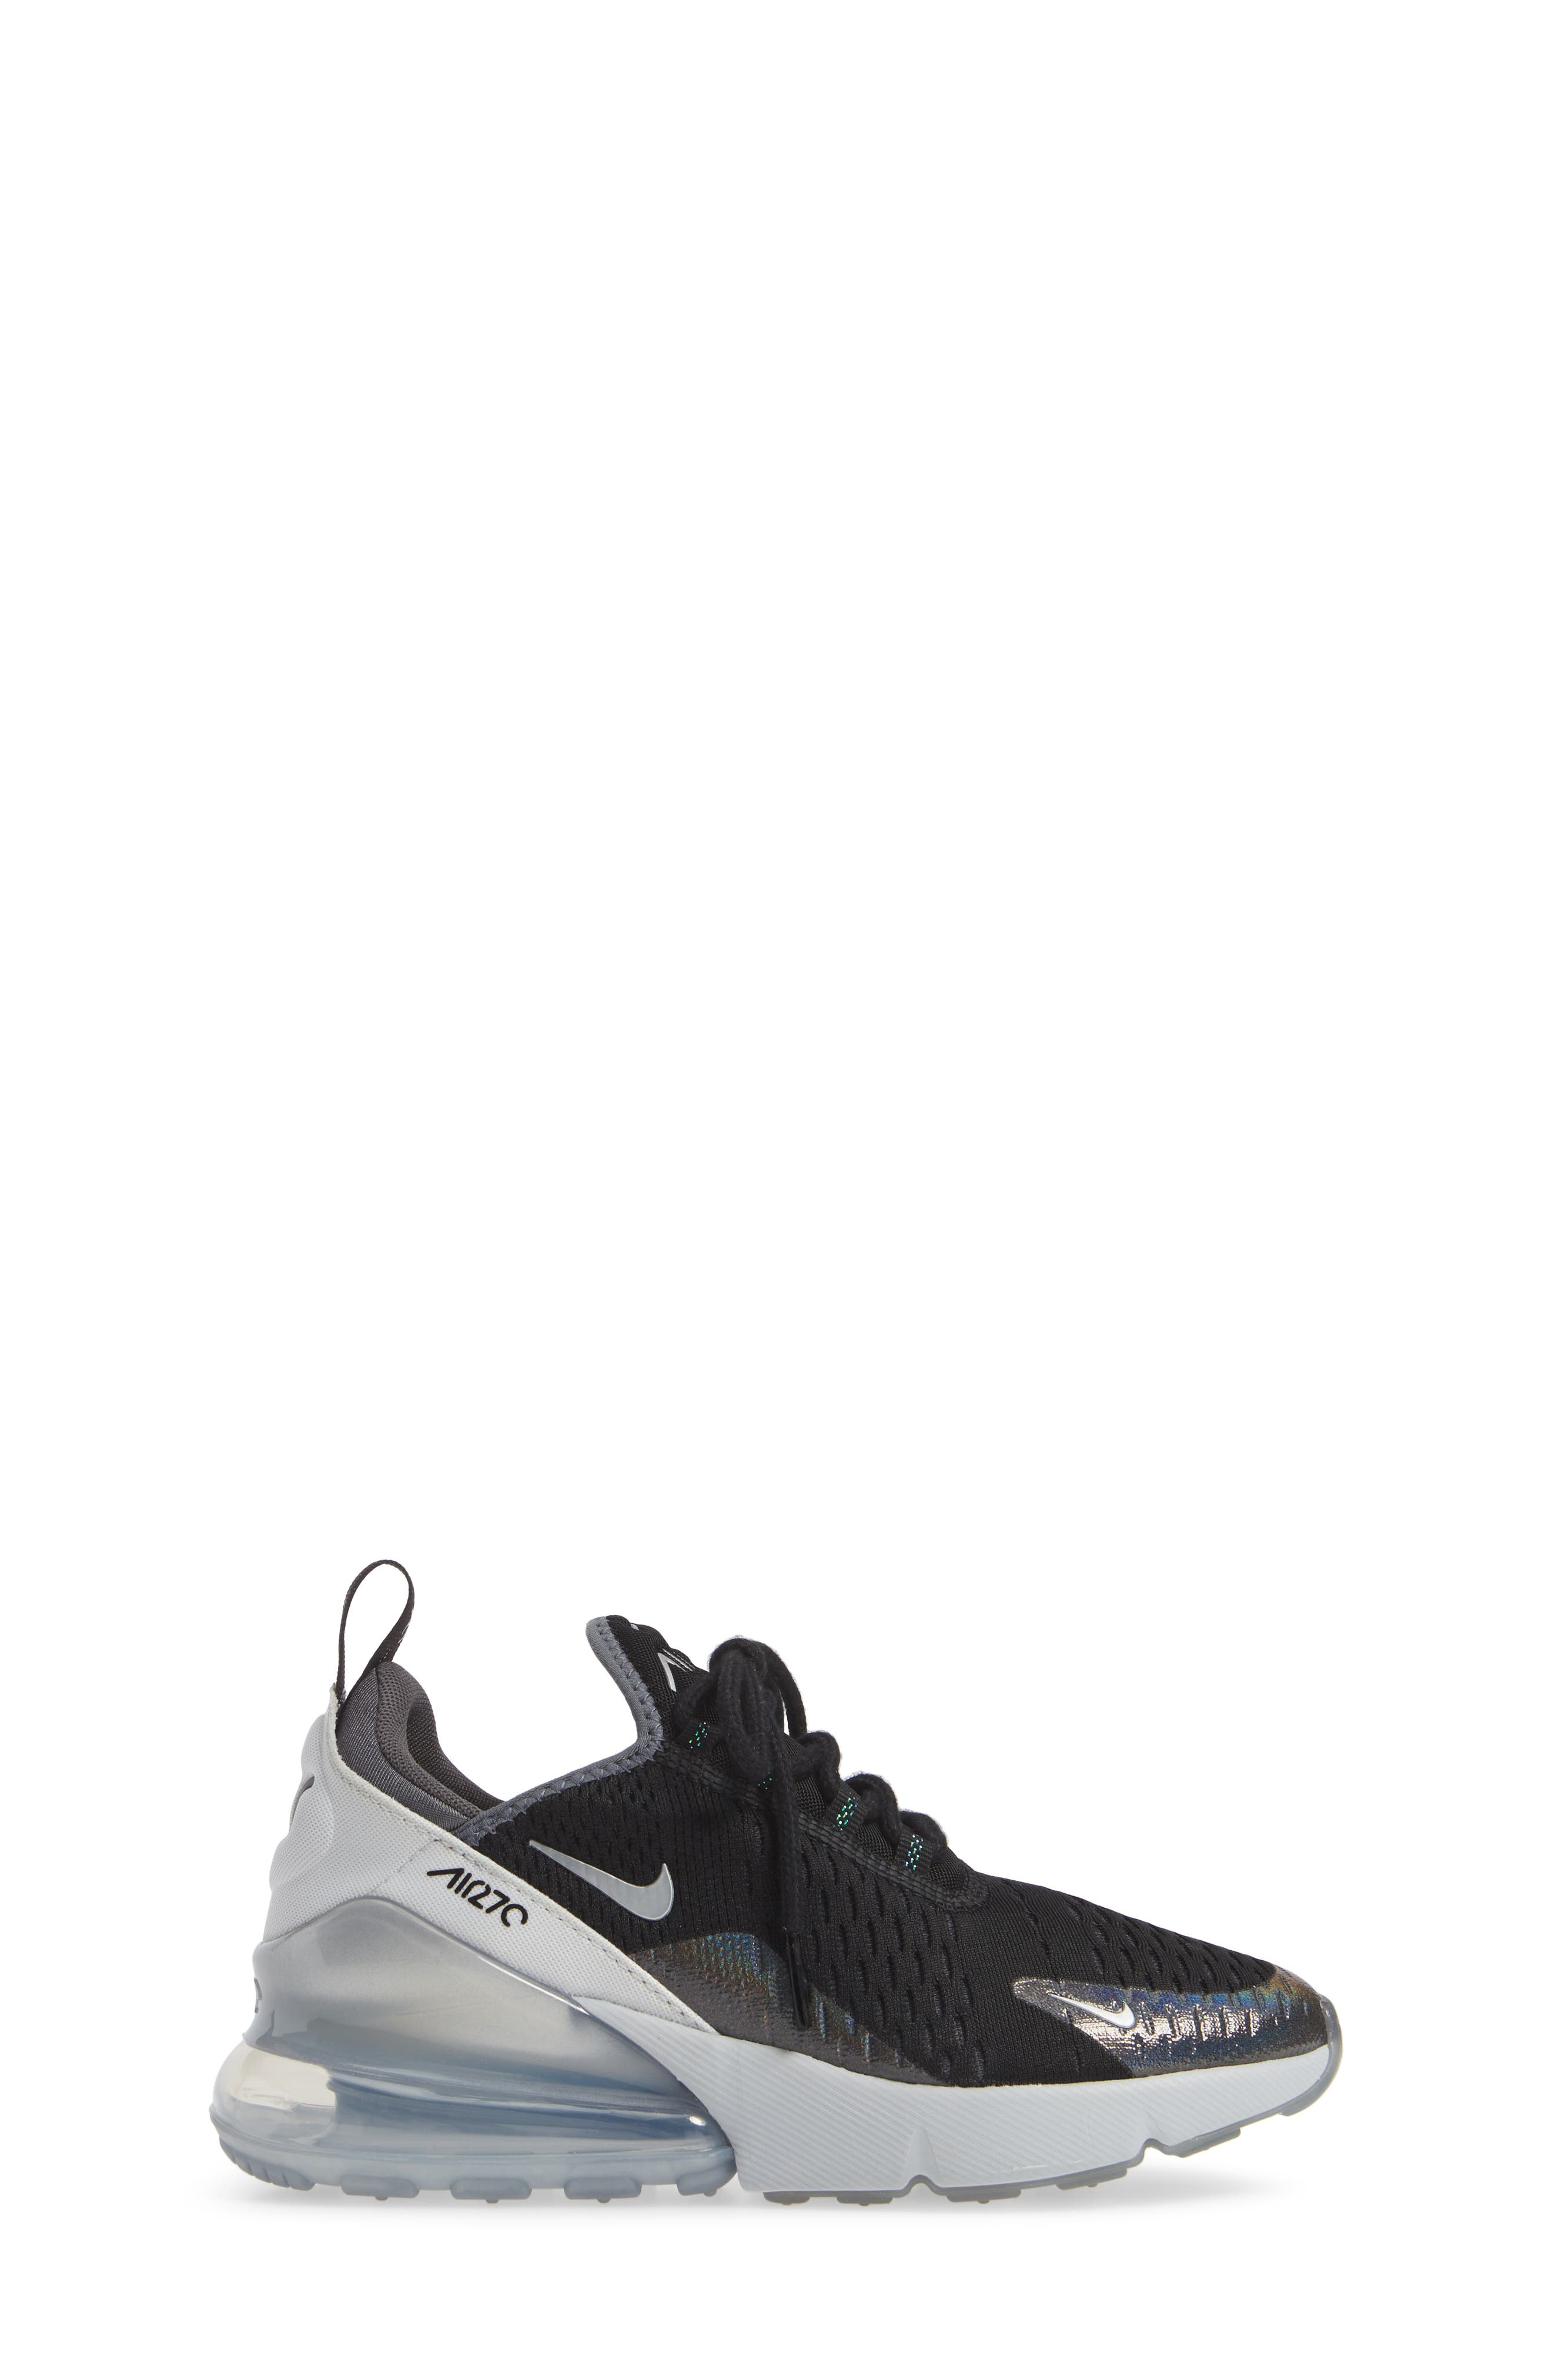 Air Max 270 Y2K Sneaker,                             Alternate thumbnail 3, color,                             BLACK